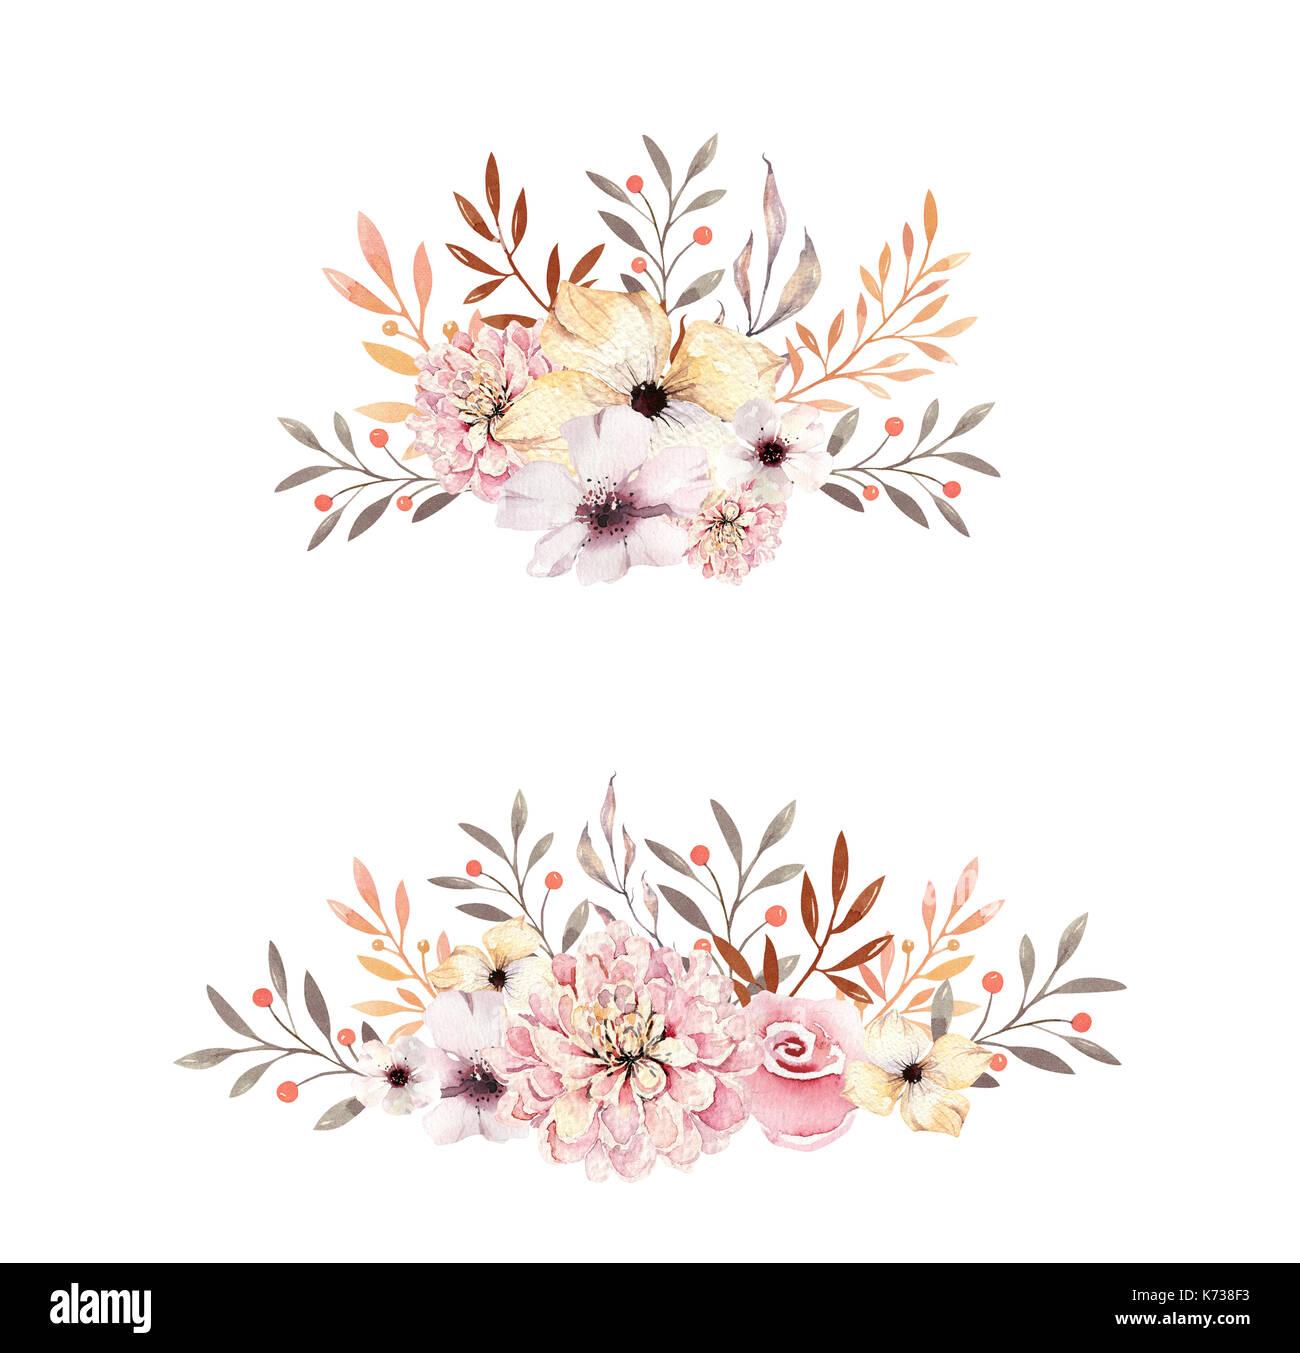 Pink Feathers Falling Wallpaper Satz Von Aquarell Boho Blumenstr 228 U 223 E Aquarell B 246 Hmischen